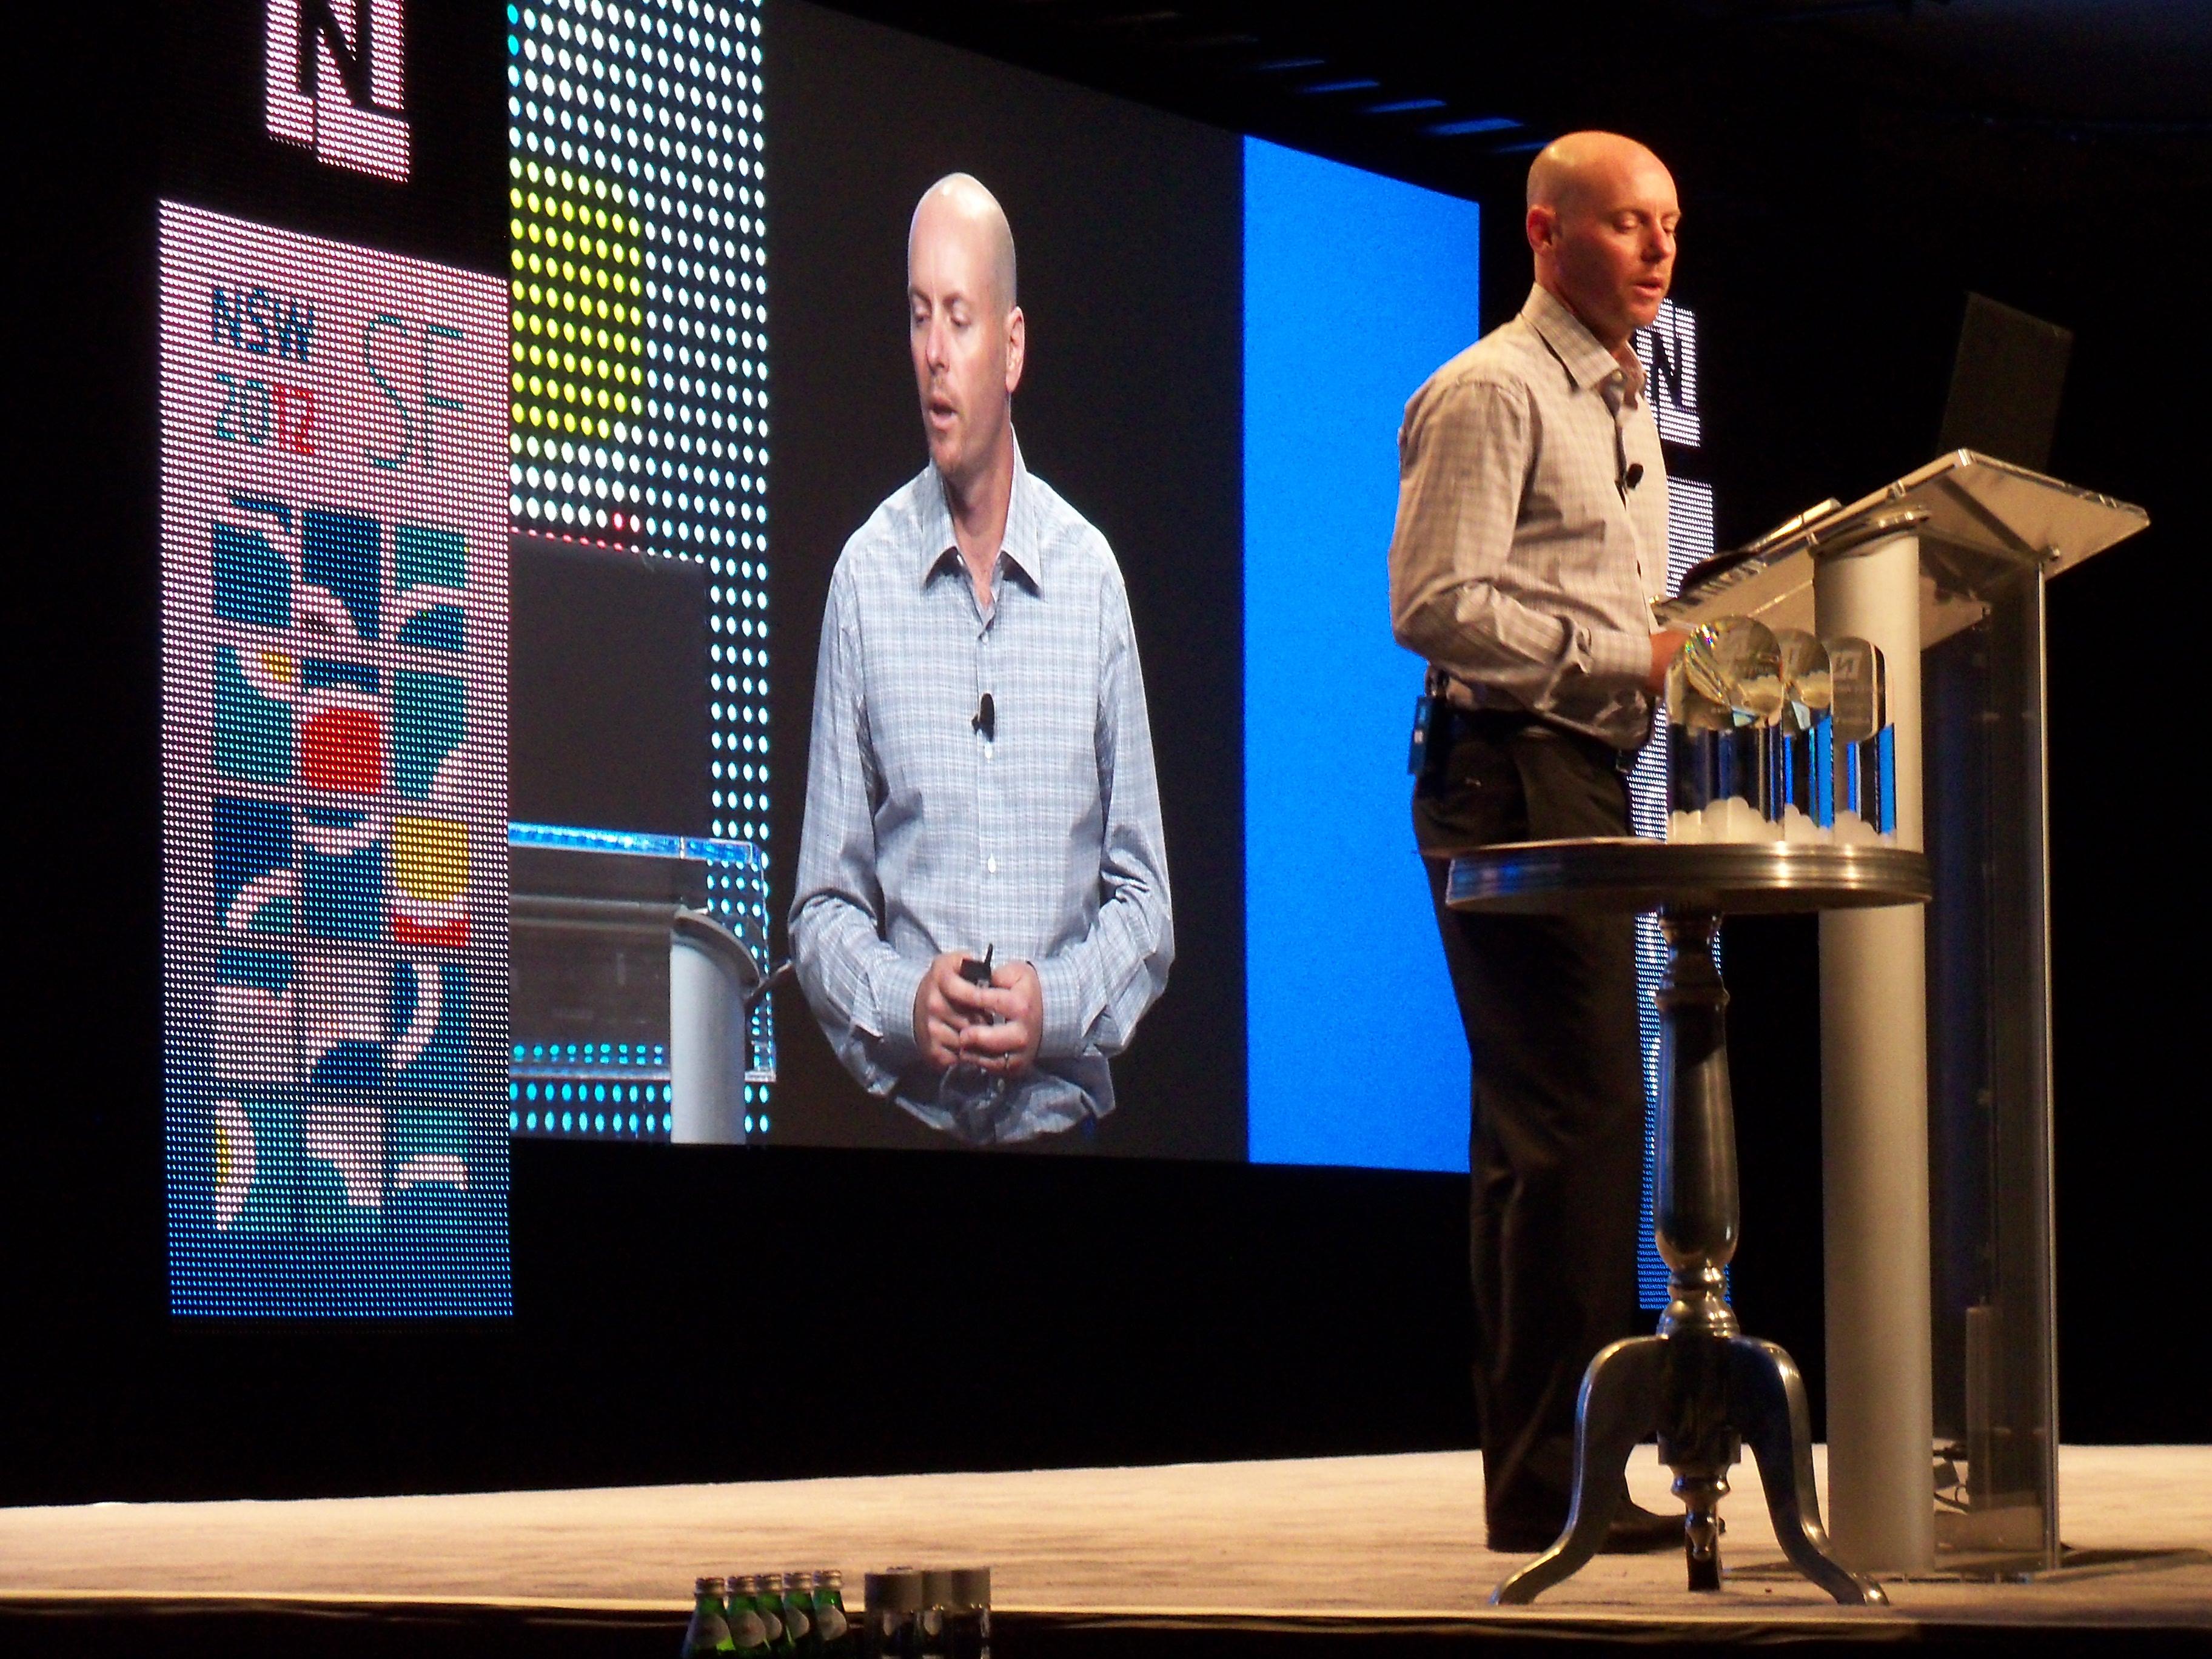 NetSuite Founder Evan Goldberg - copyright 2012 TechVentive, Inc.